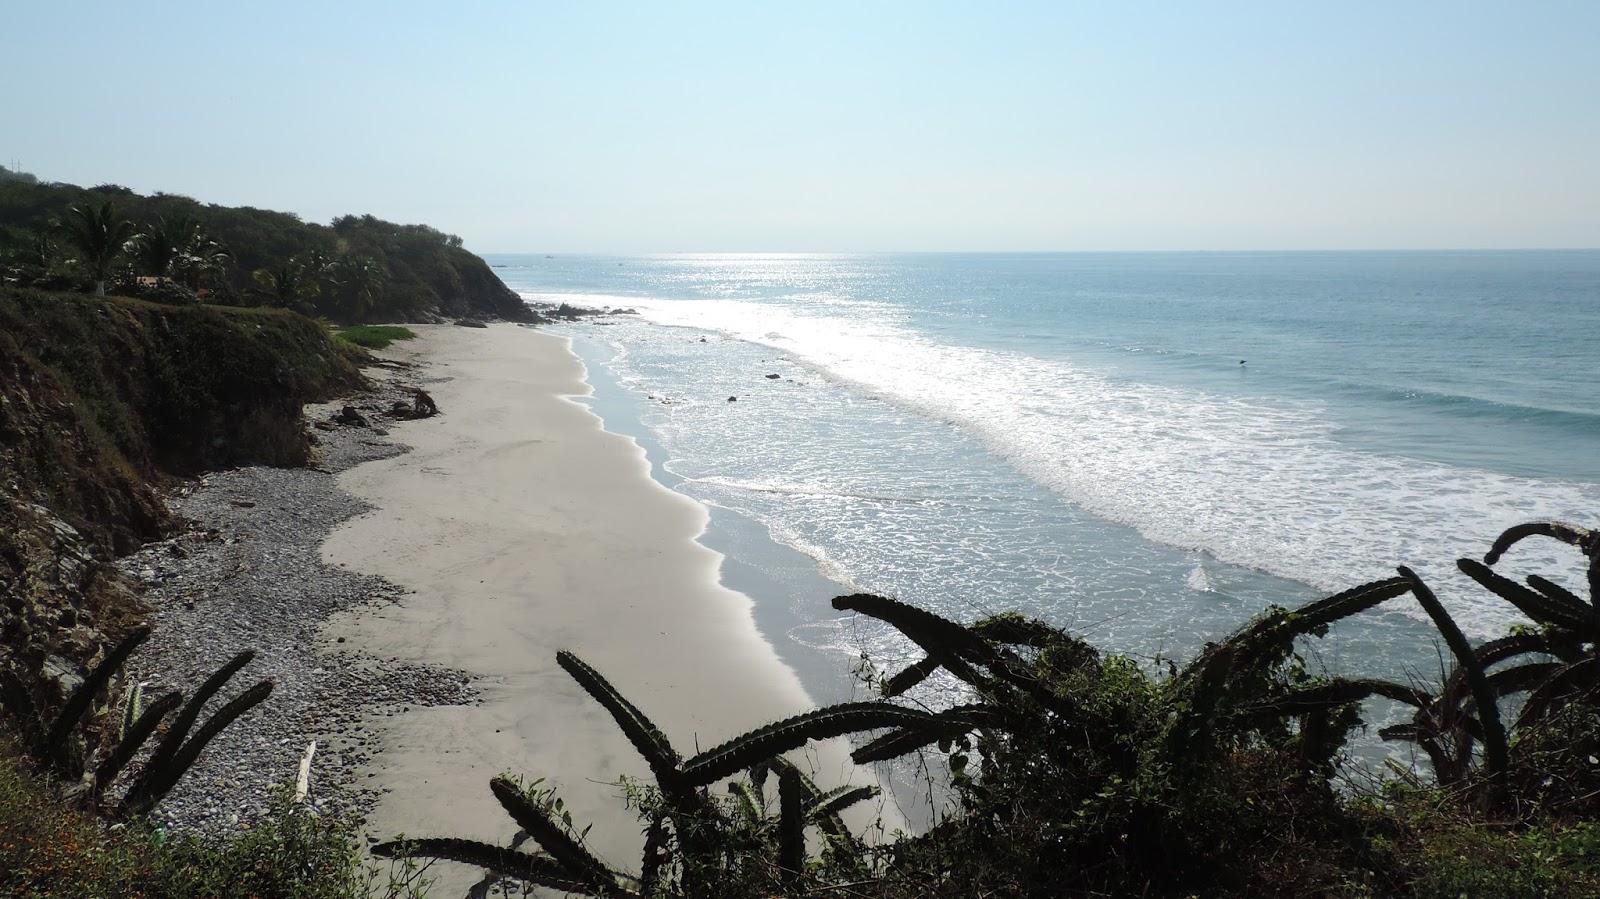 Beach Camping North Of Puerto Vallarta